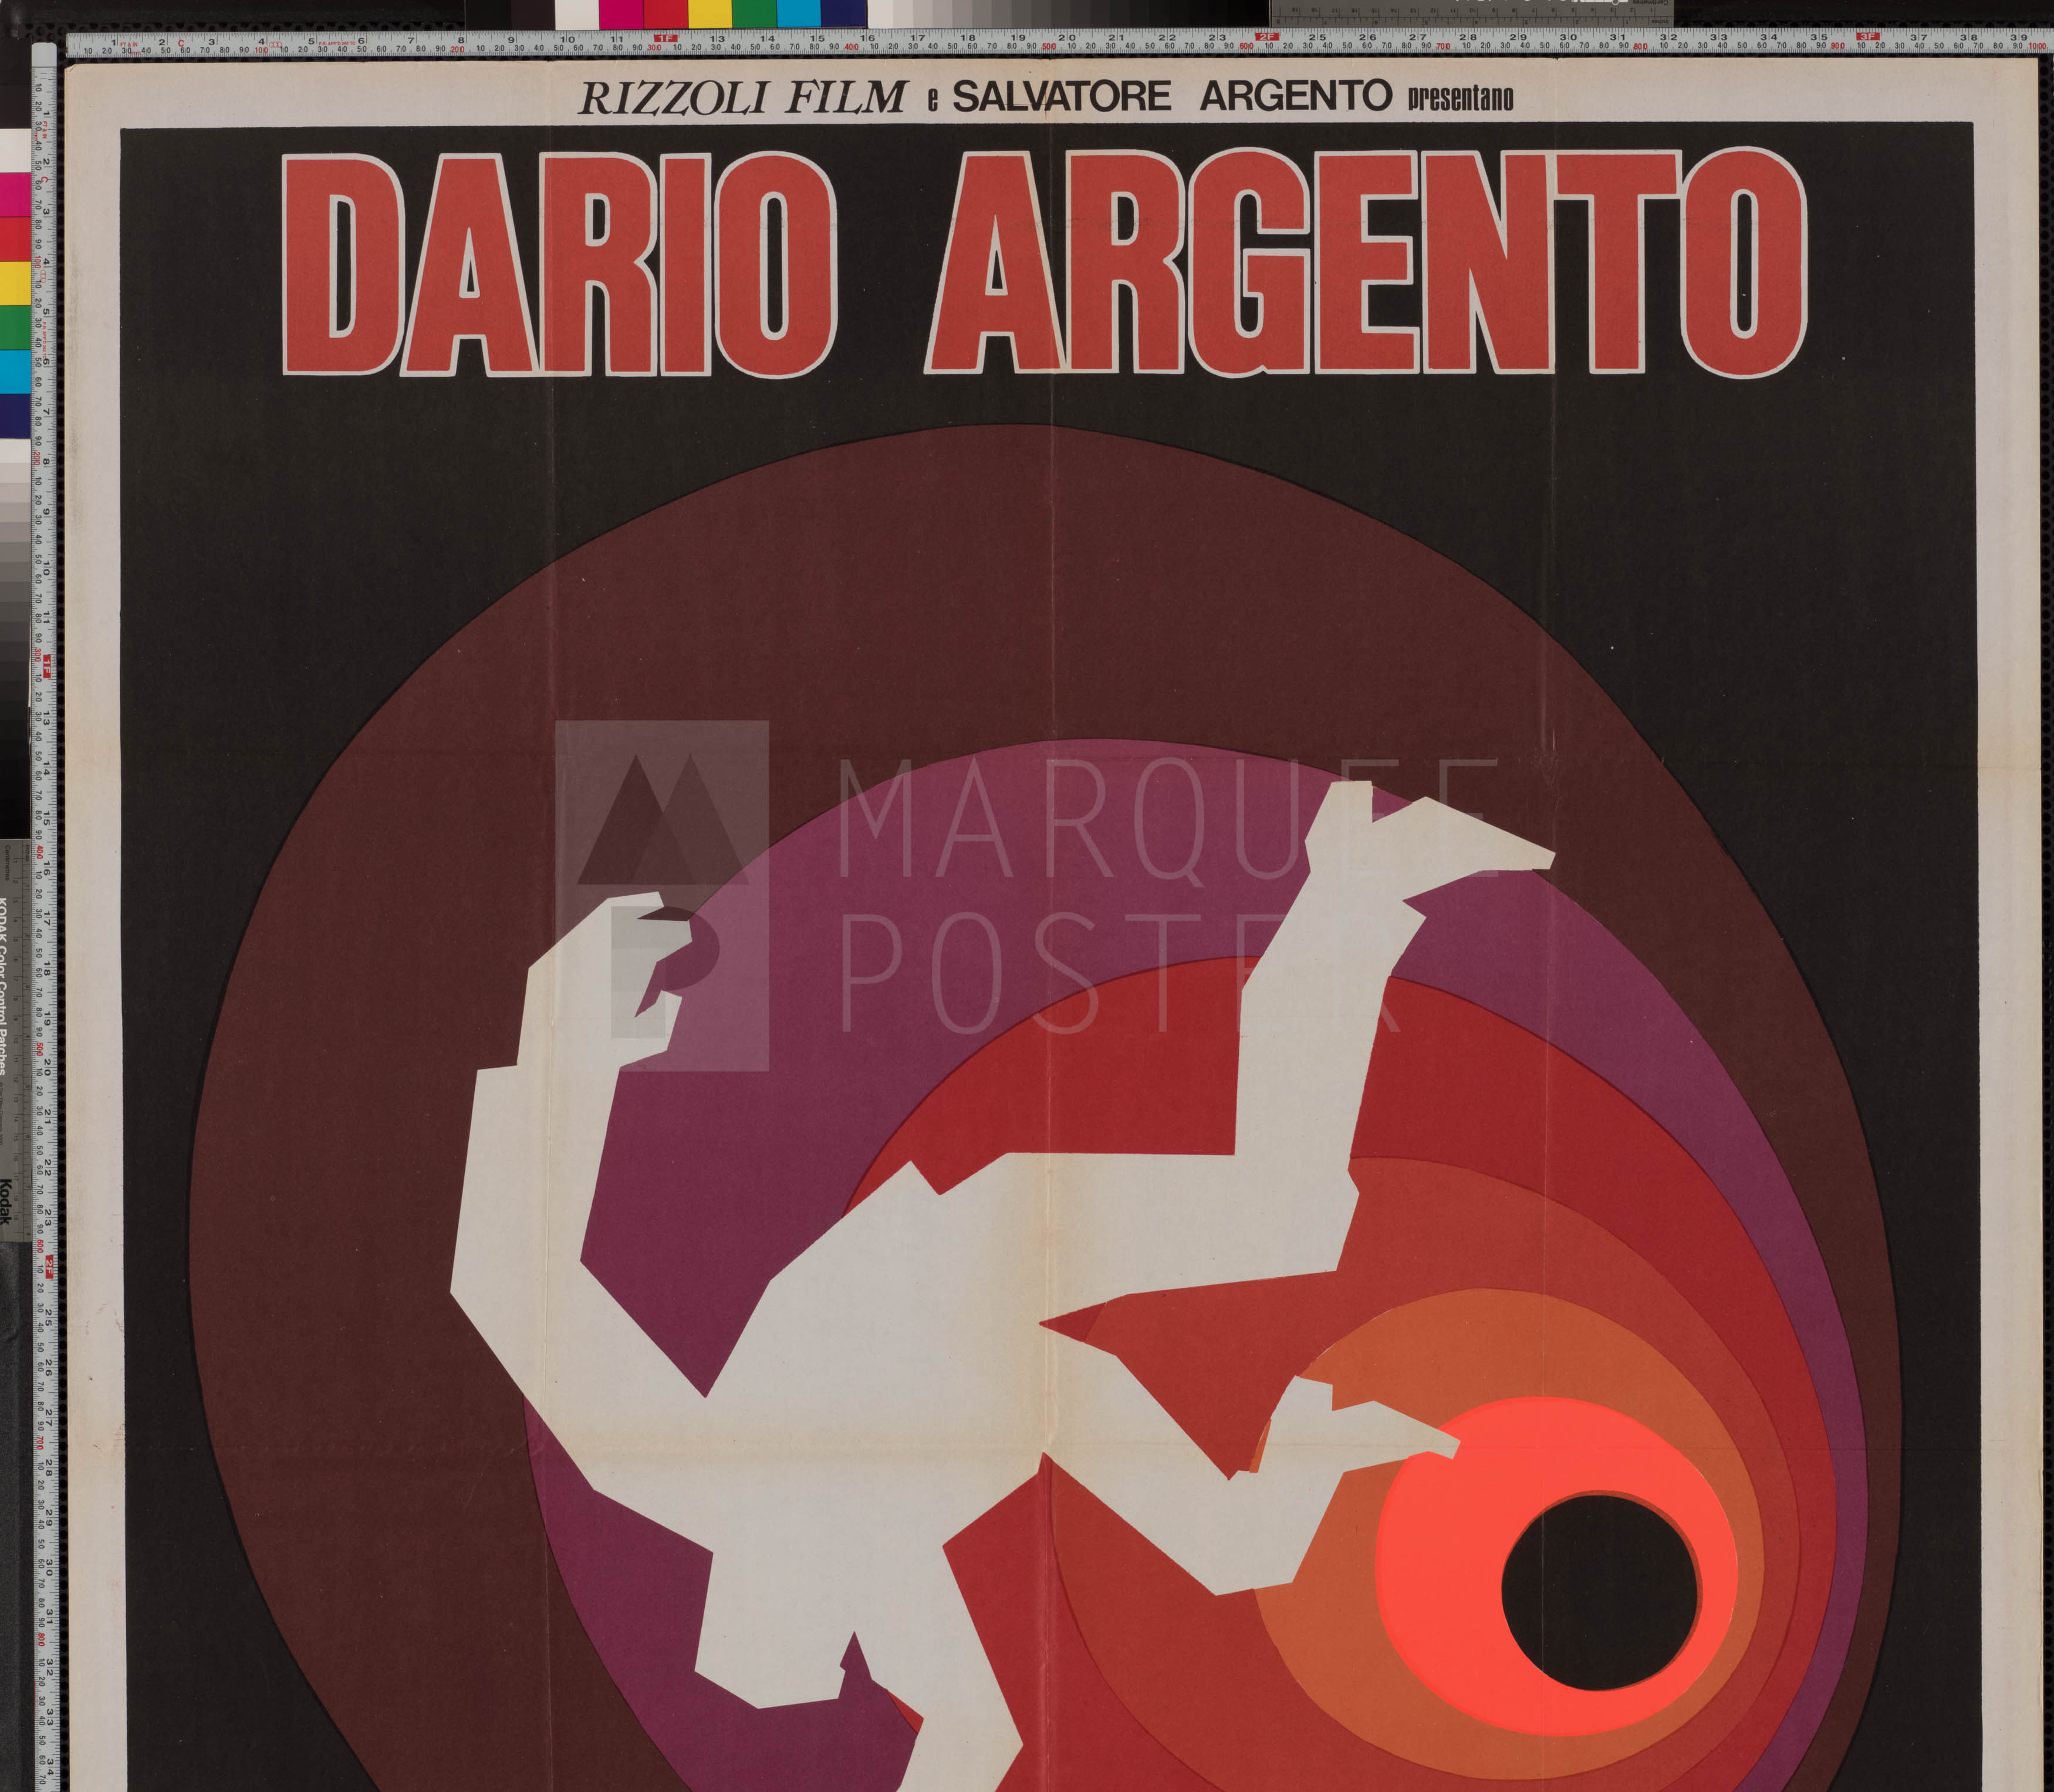 11-deep-red-italian-2-foglio-1975-02